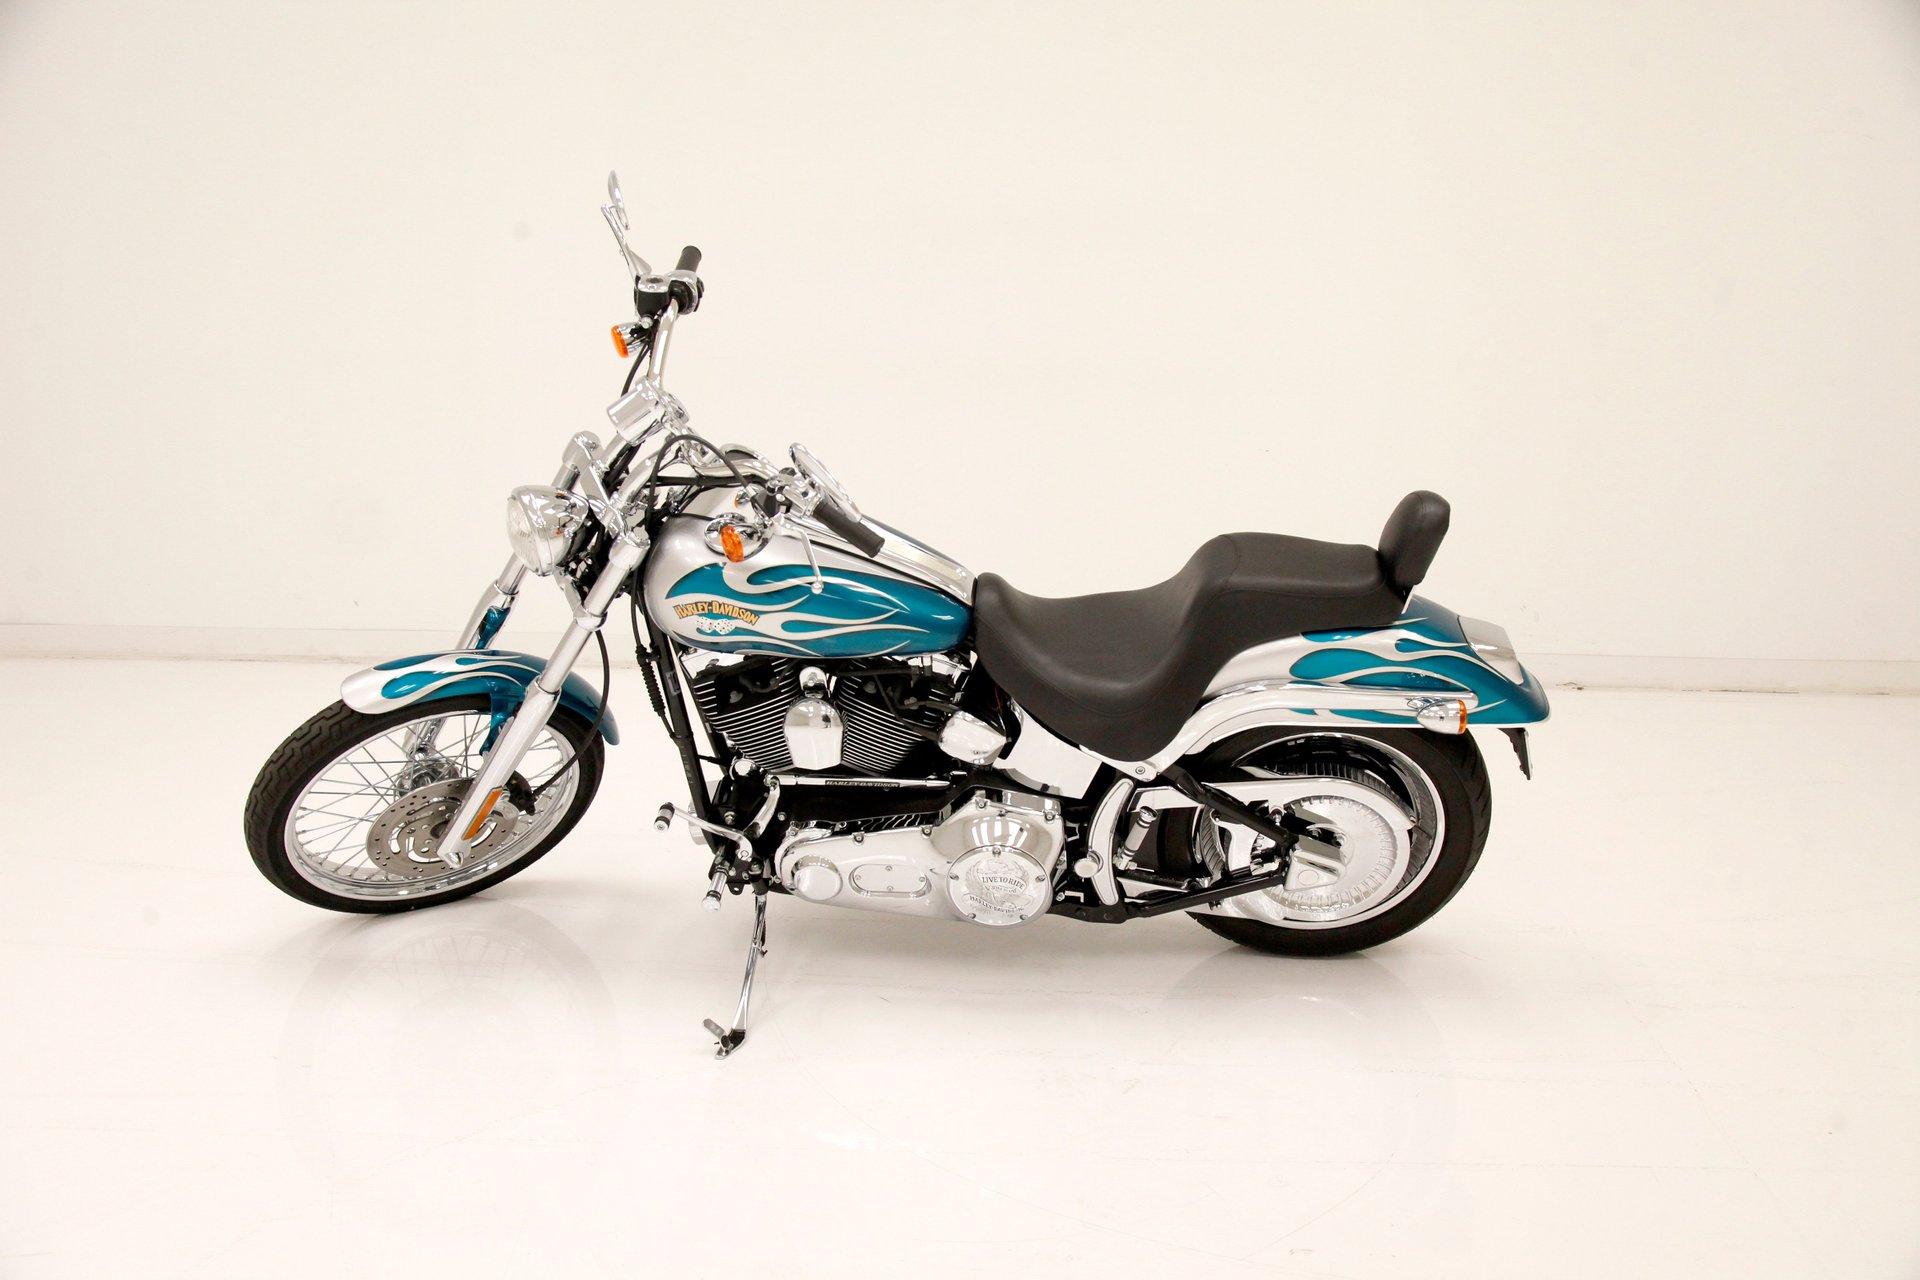 2003 Harley Davidson Deuce Softtail